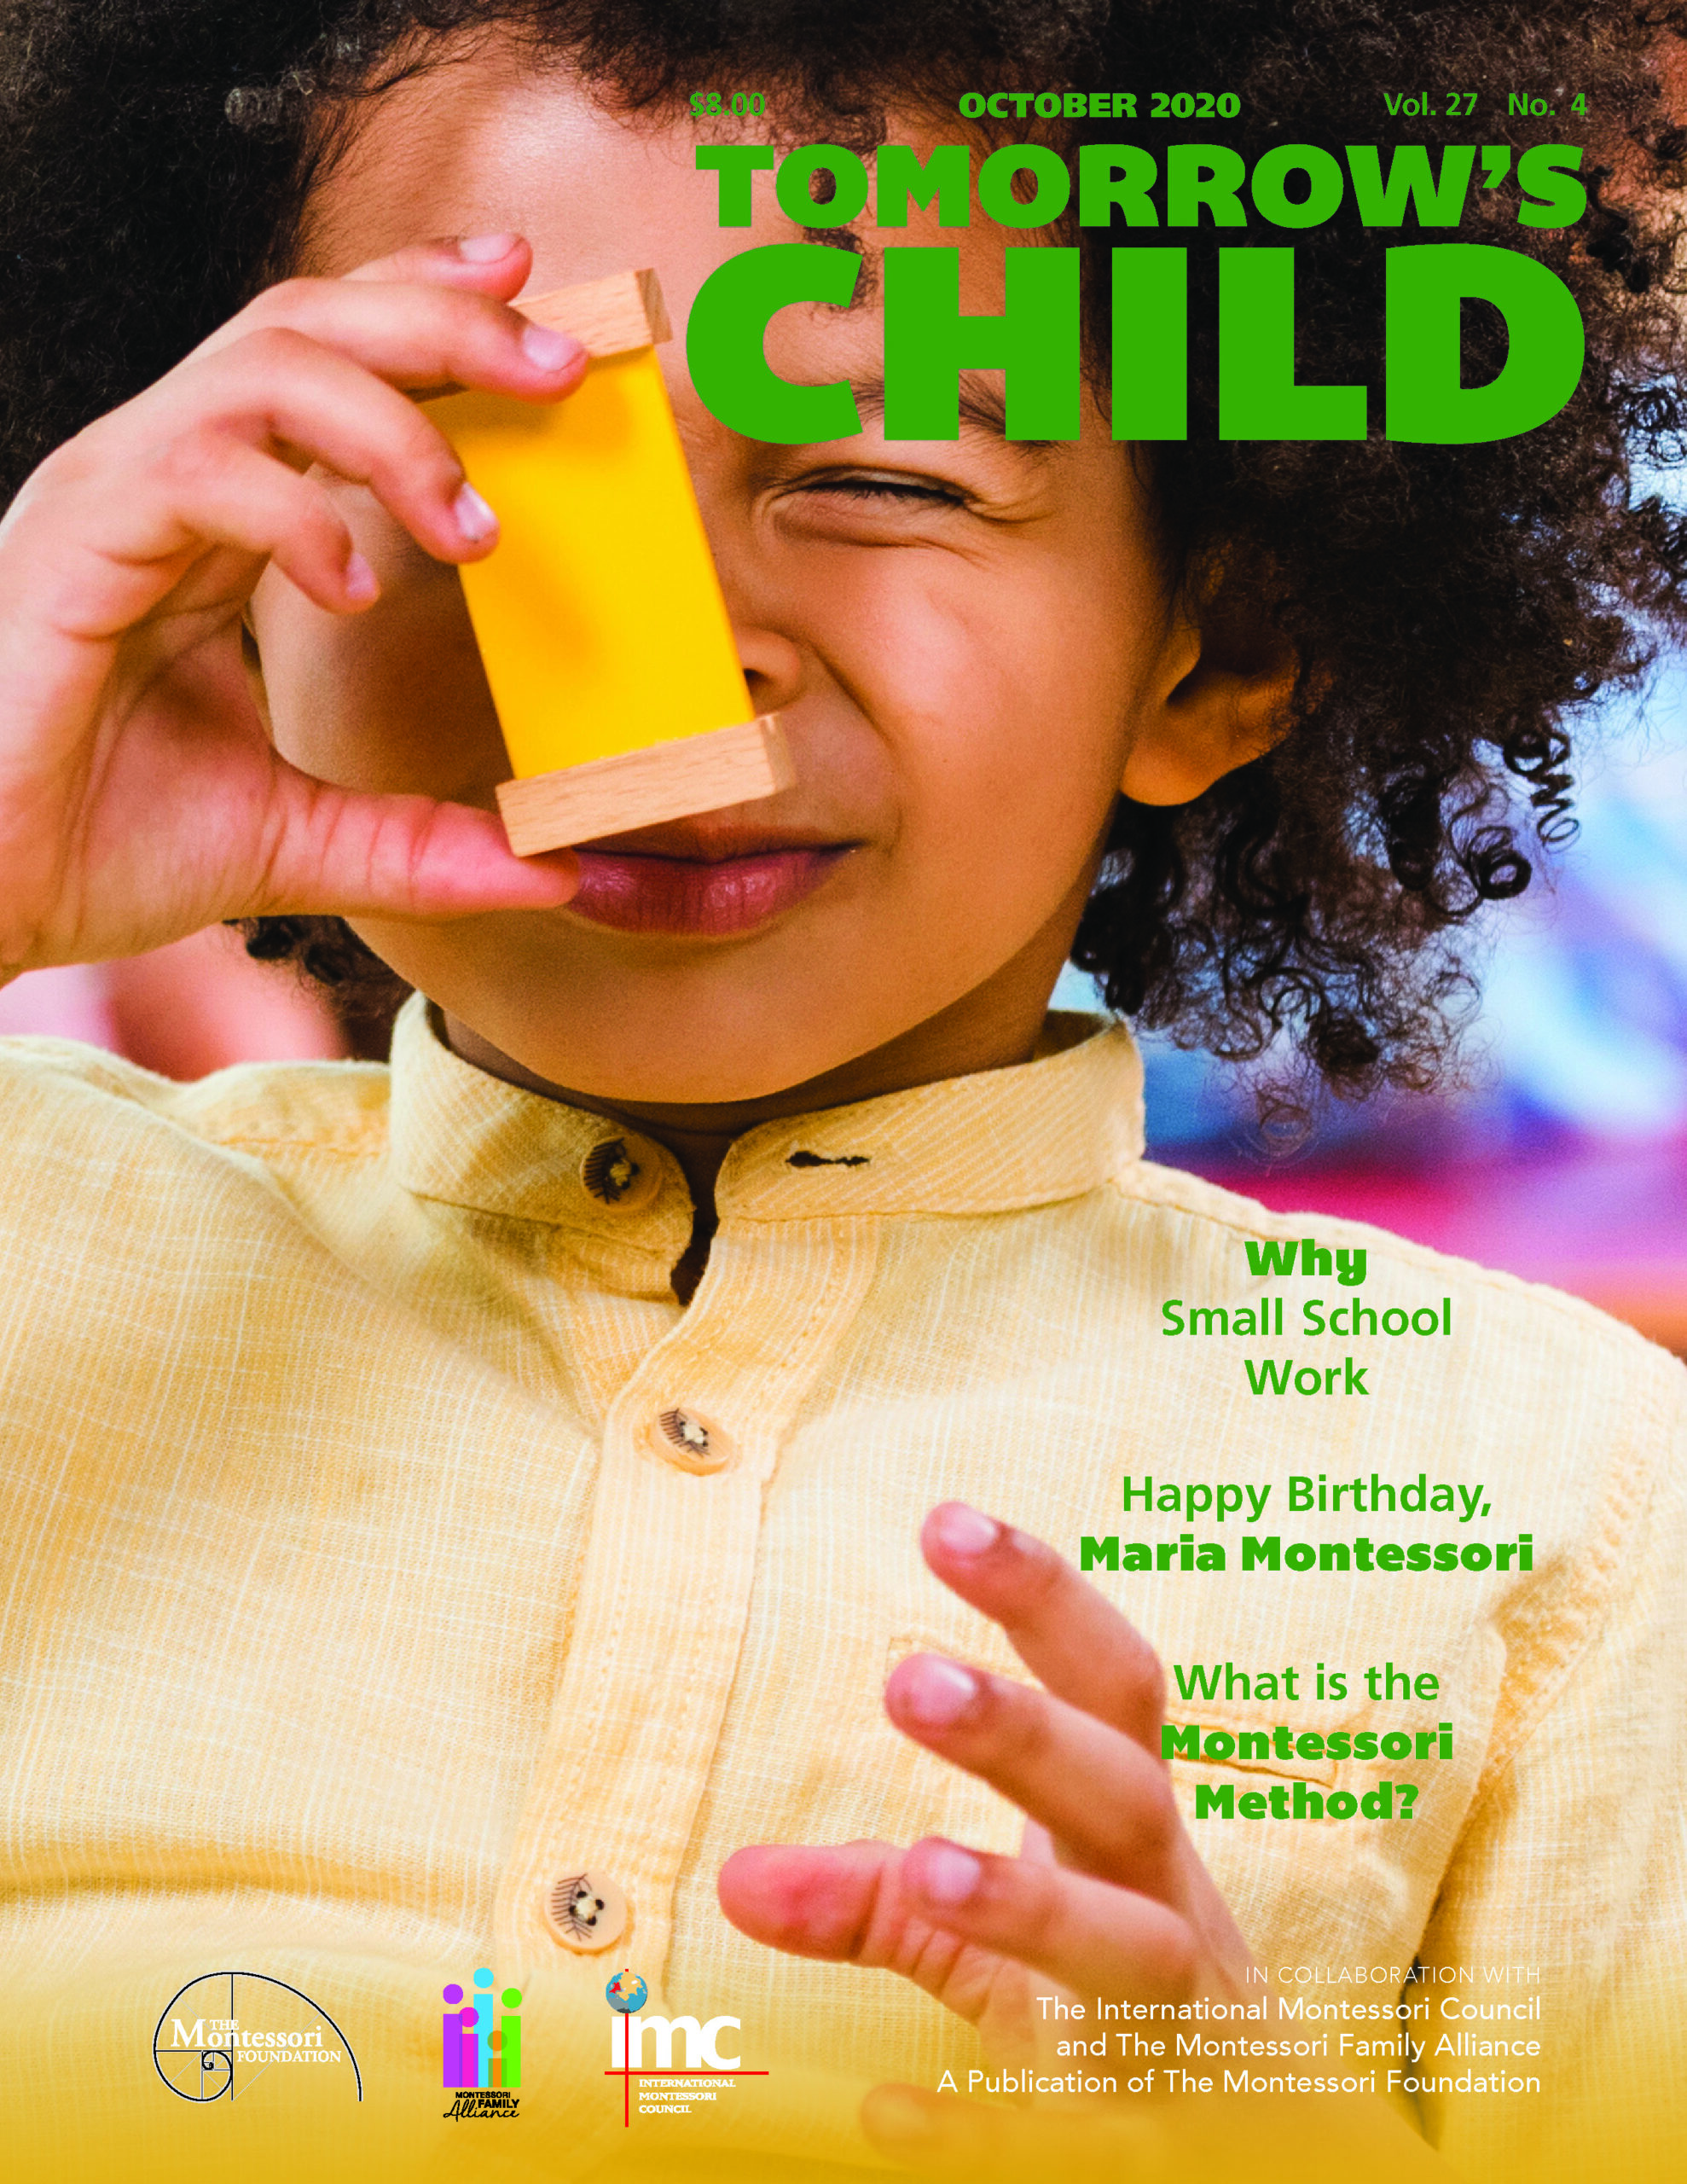 Tomorrow's Child | October 2020